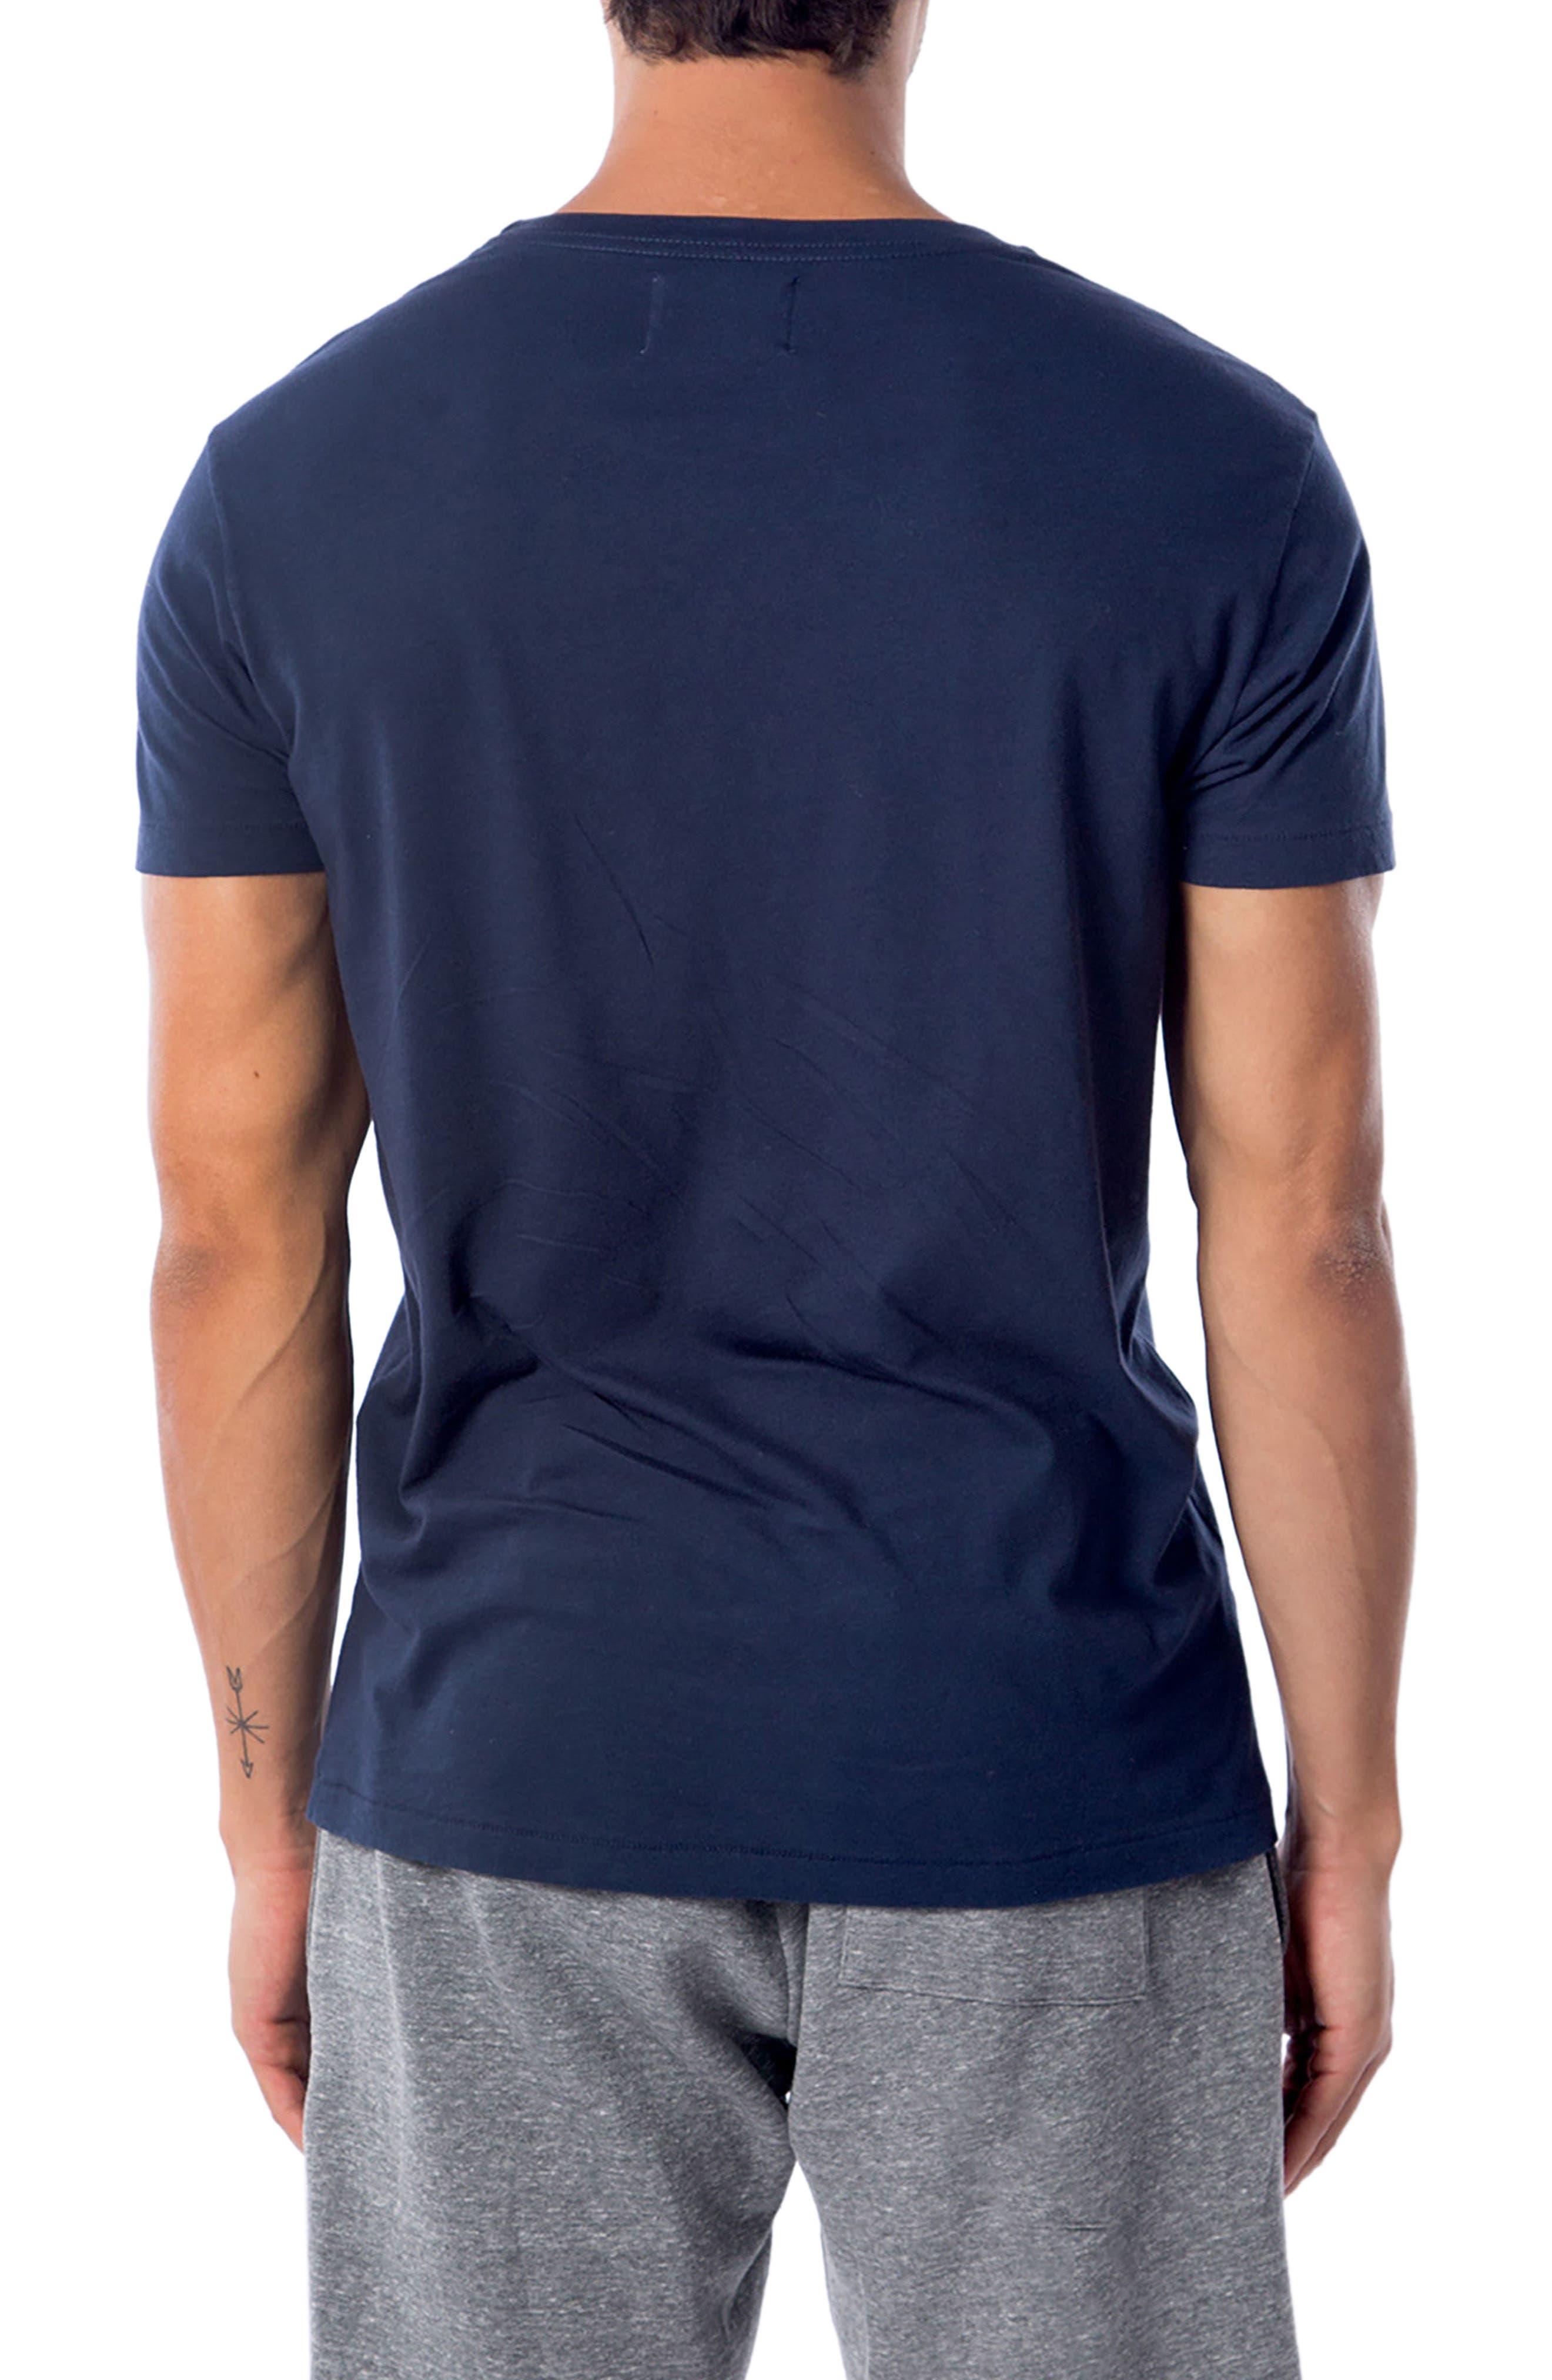 American Waves T-Shirt,                             Alternate thumbnail 2, color,                             Indigo